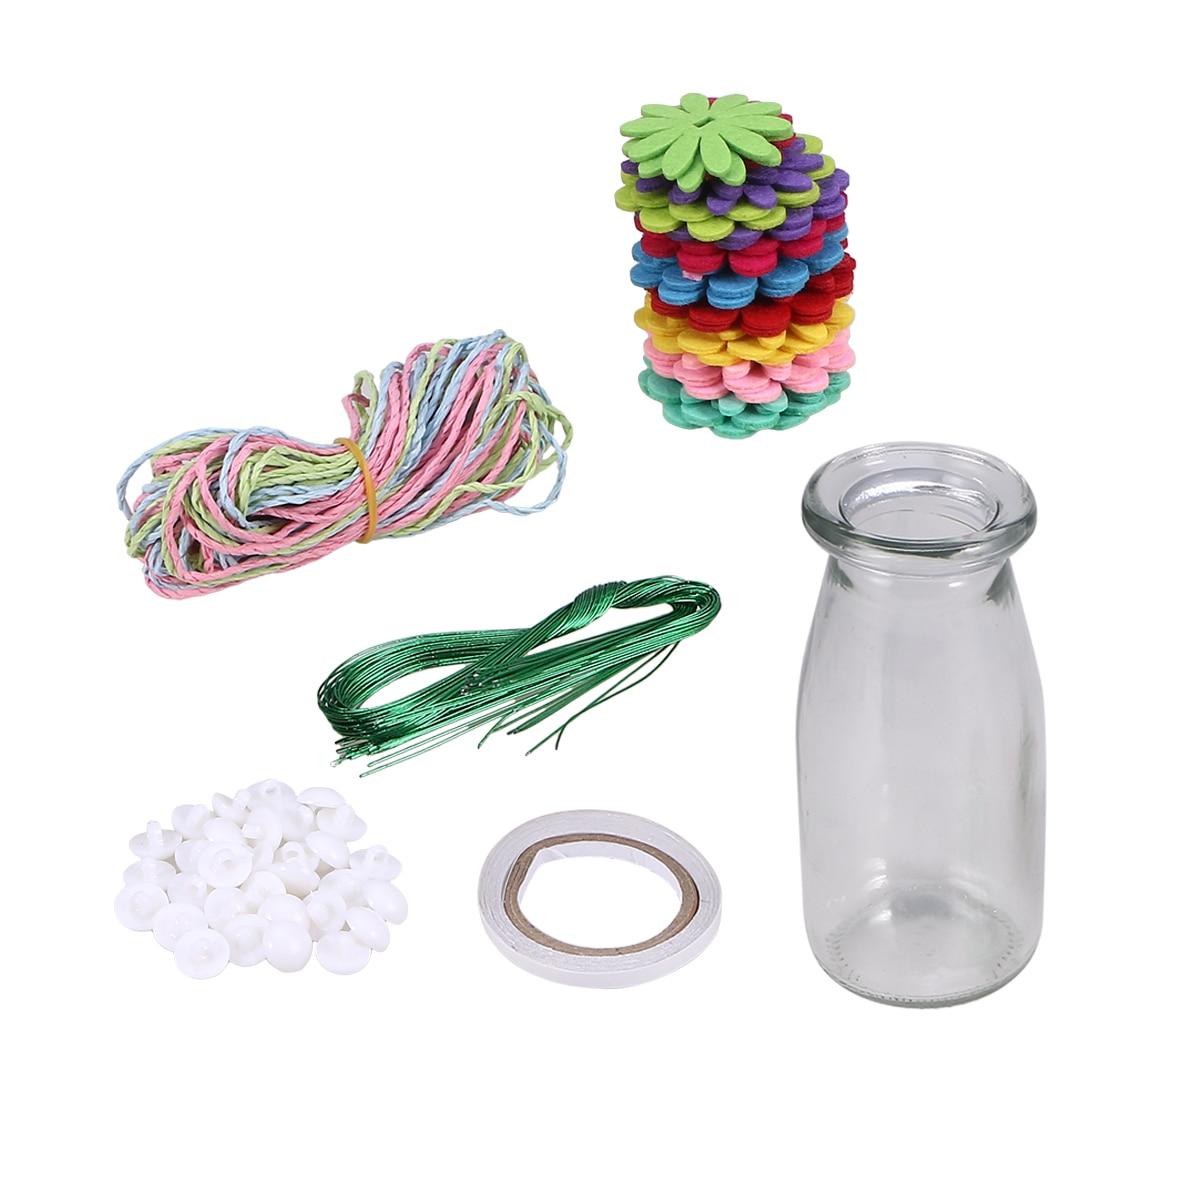 NICEXMAS 1 Set Material DIY Handmade Creative Material Package For Toddlers